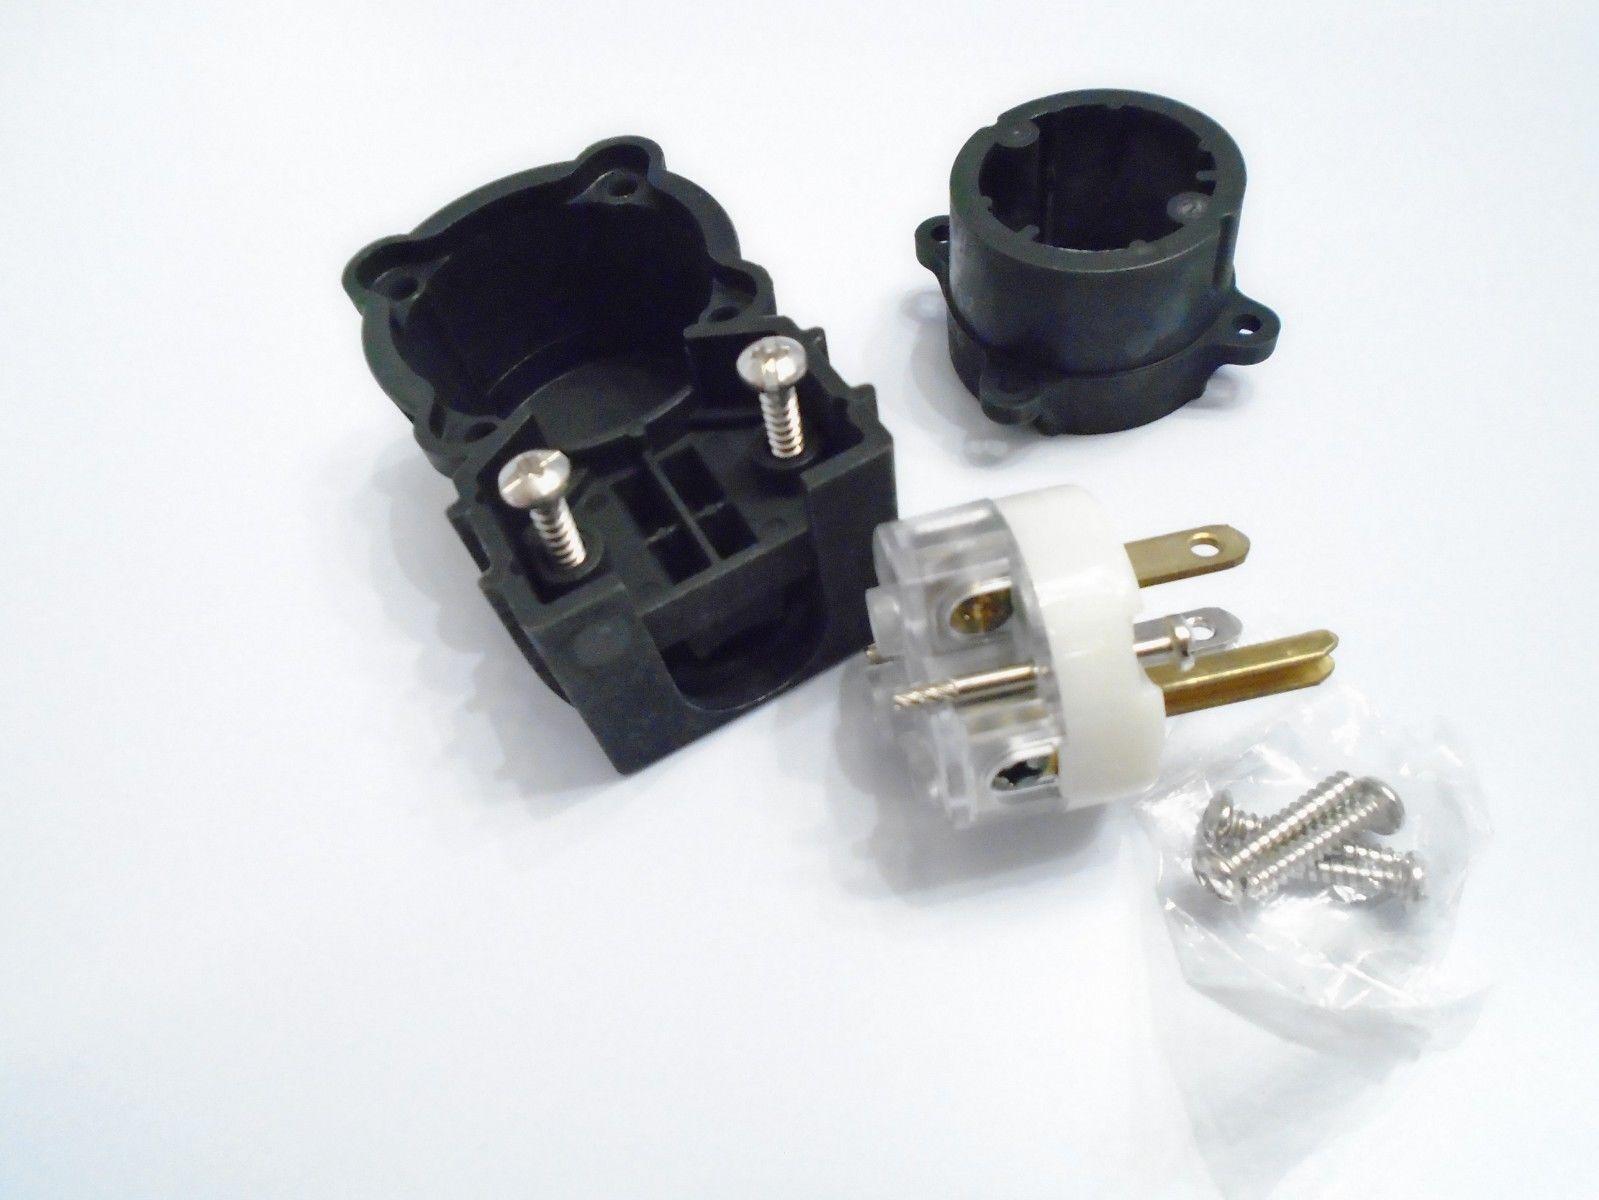 90 Angle Plug 15a 125 Vac Pass Seymour Legrand 5266 Xgcman 3 Pole Ebay Extension Cord Replacement Electrical Plugs 15amp 125v Prong